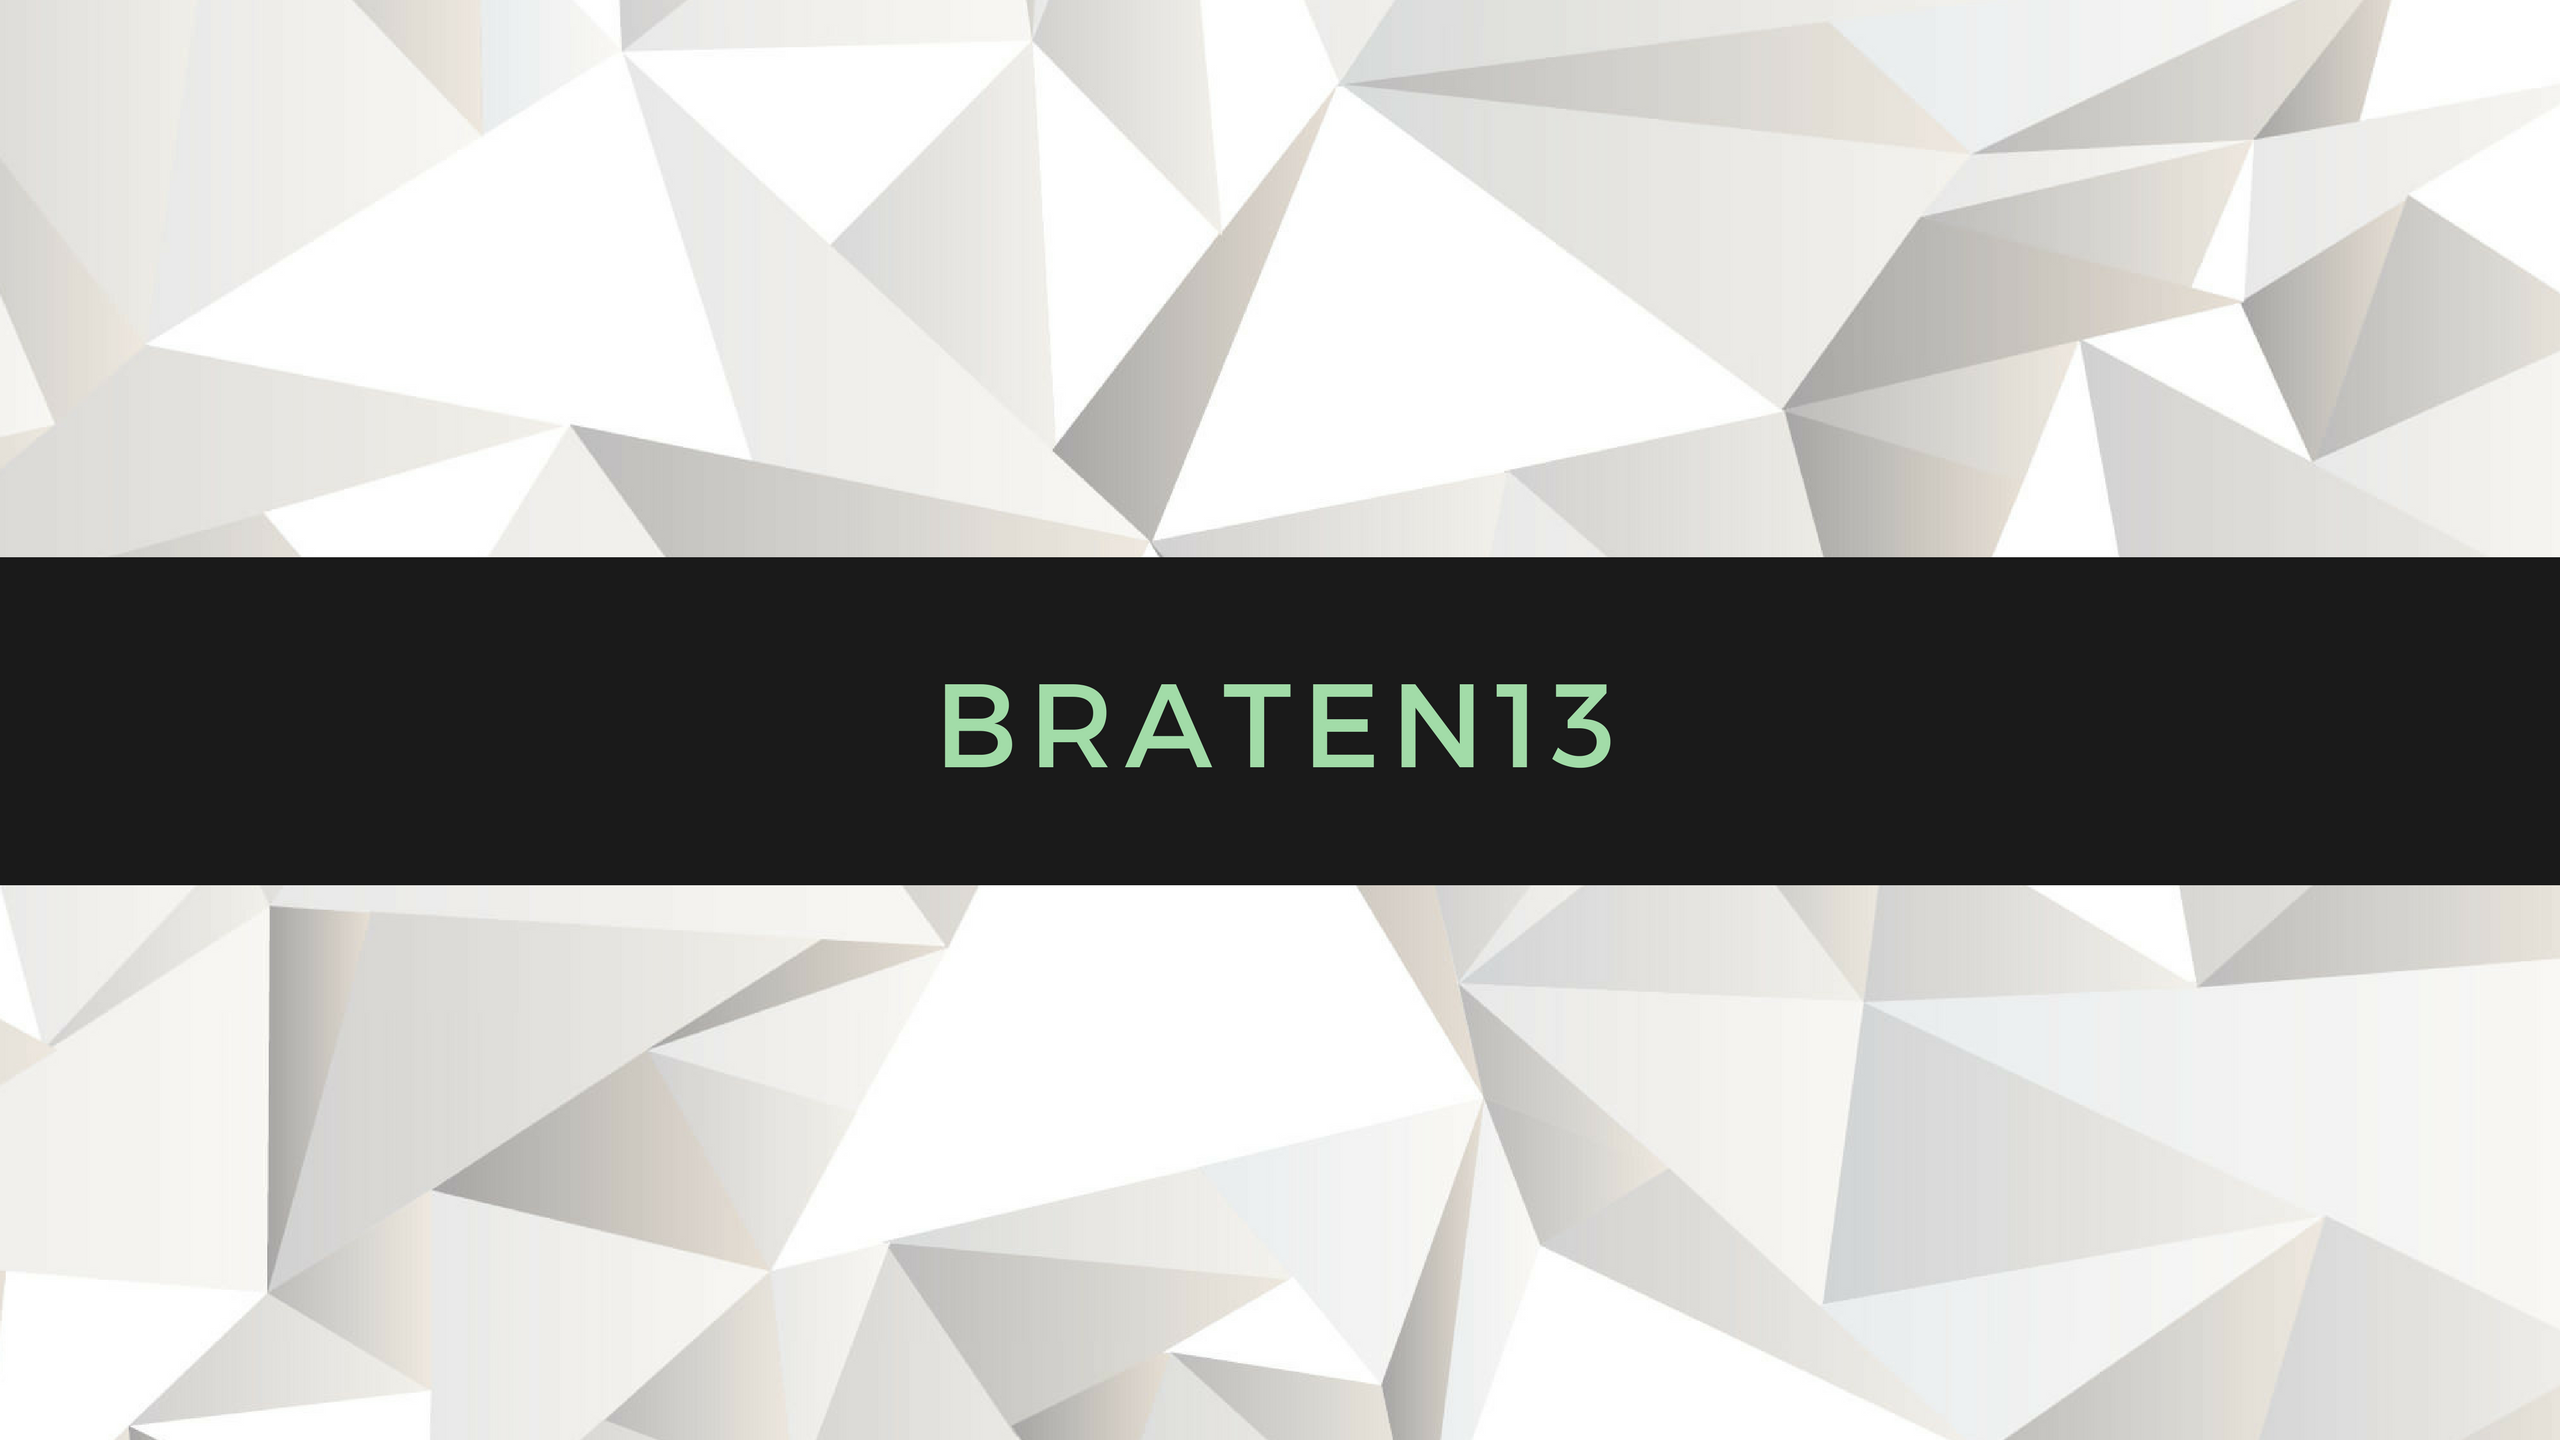 Braten13